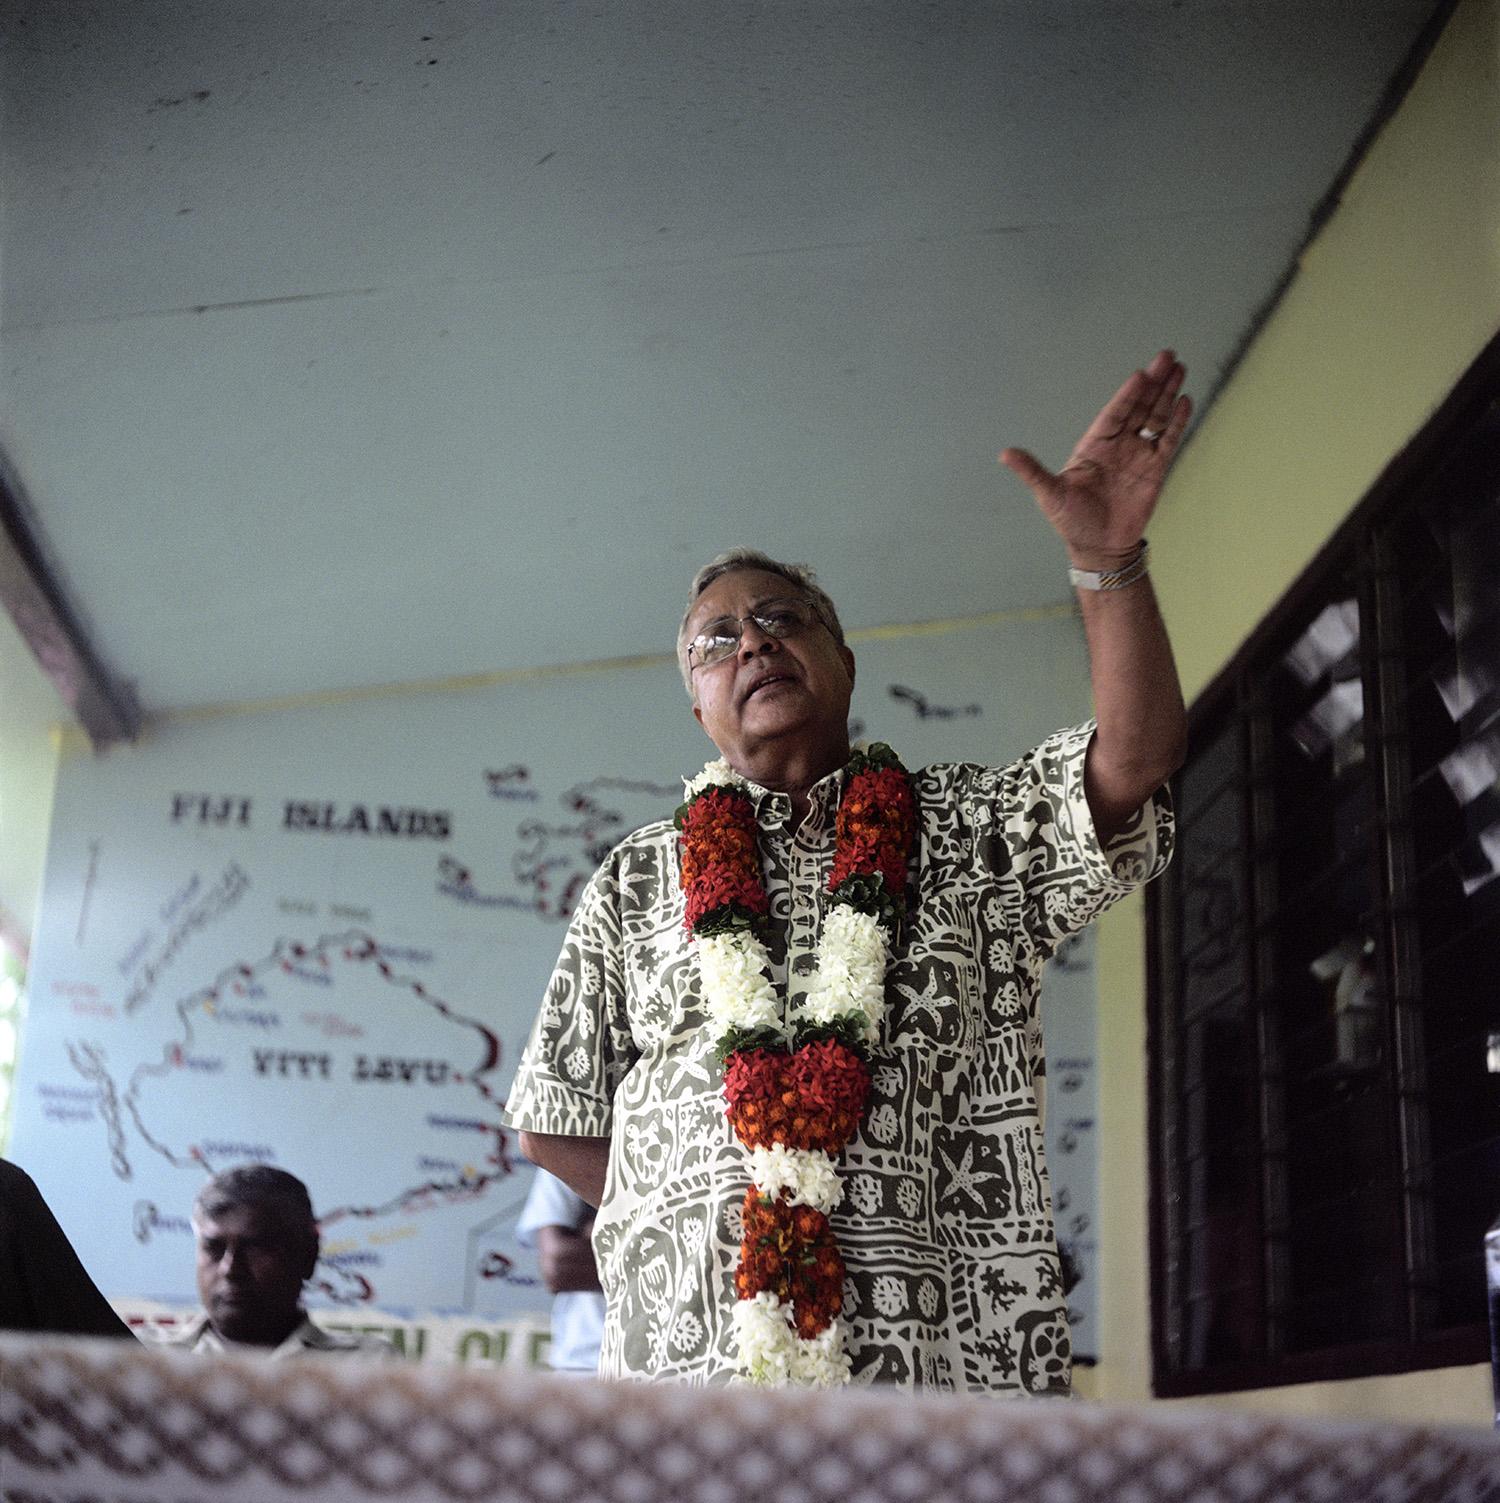 The former Prime Minister